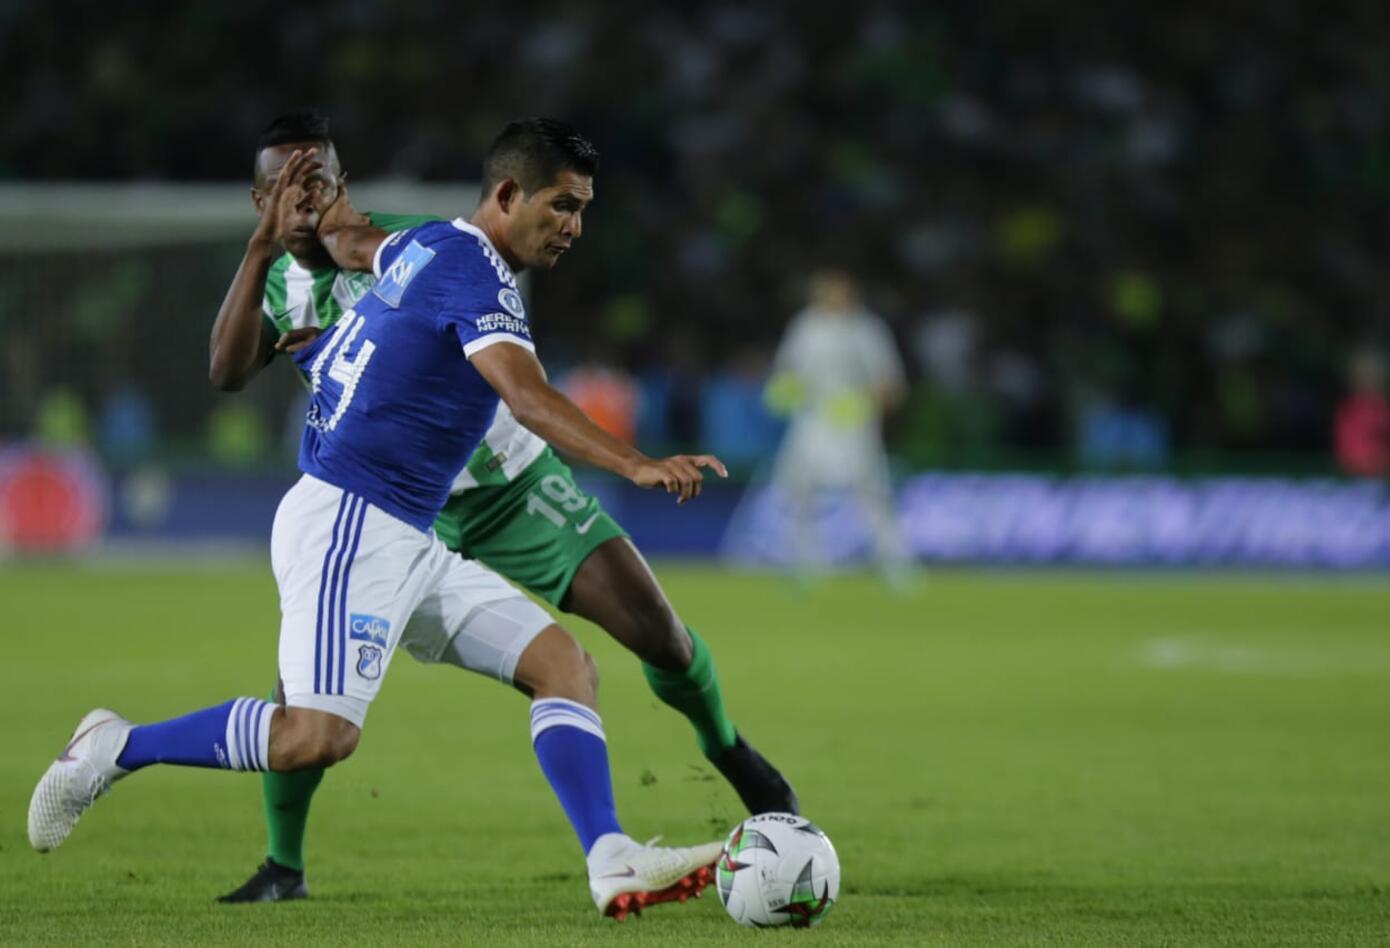 David Macalister Silva jugando ante Nacional